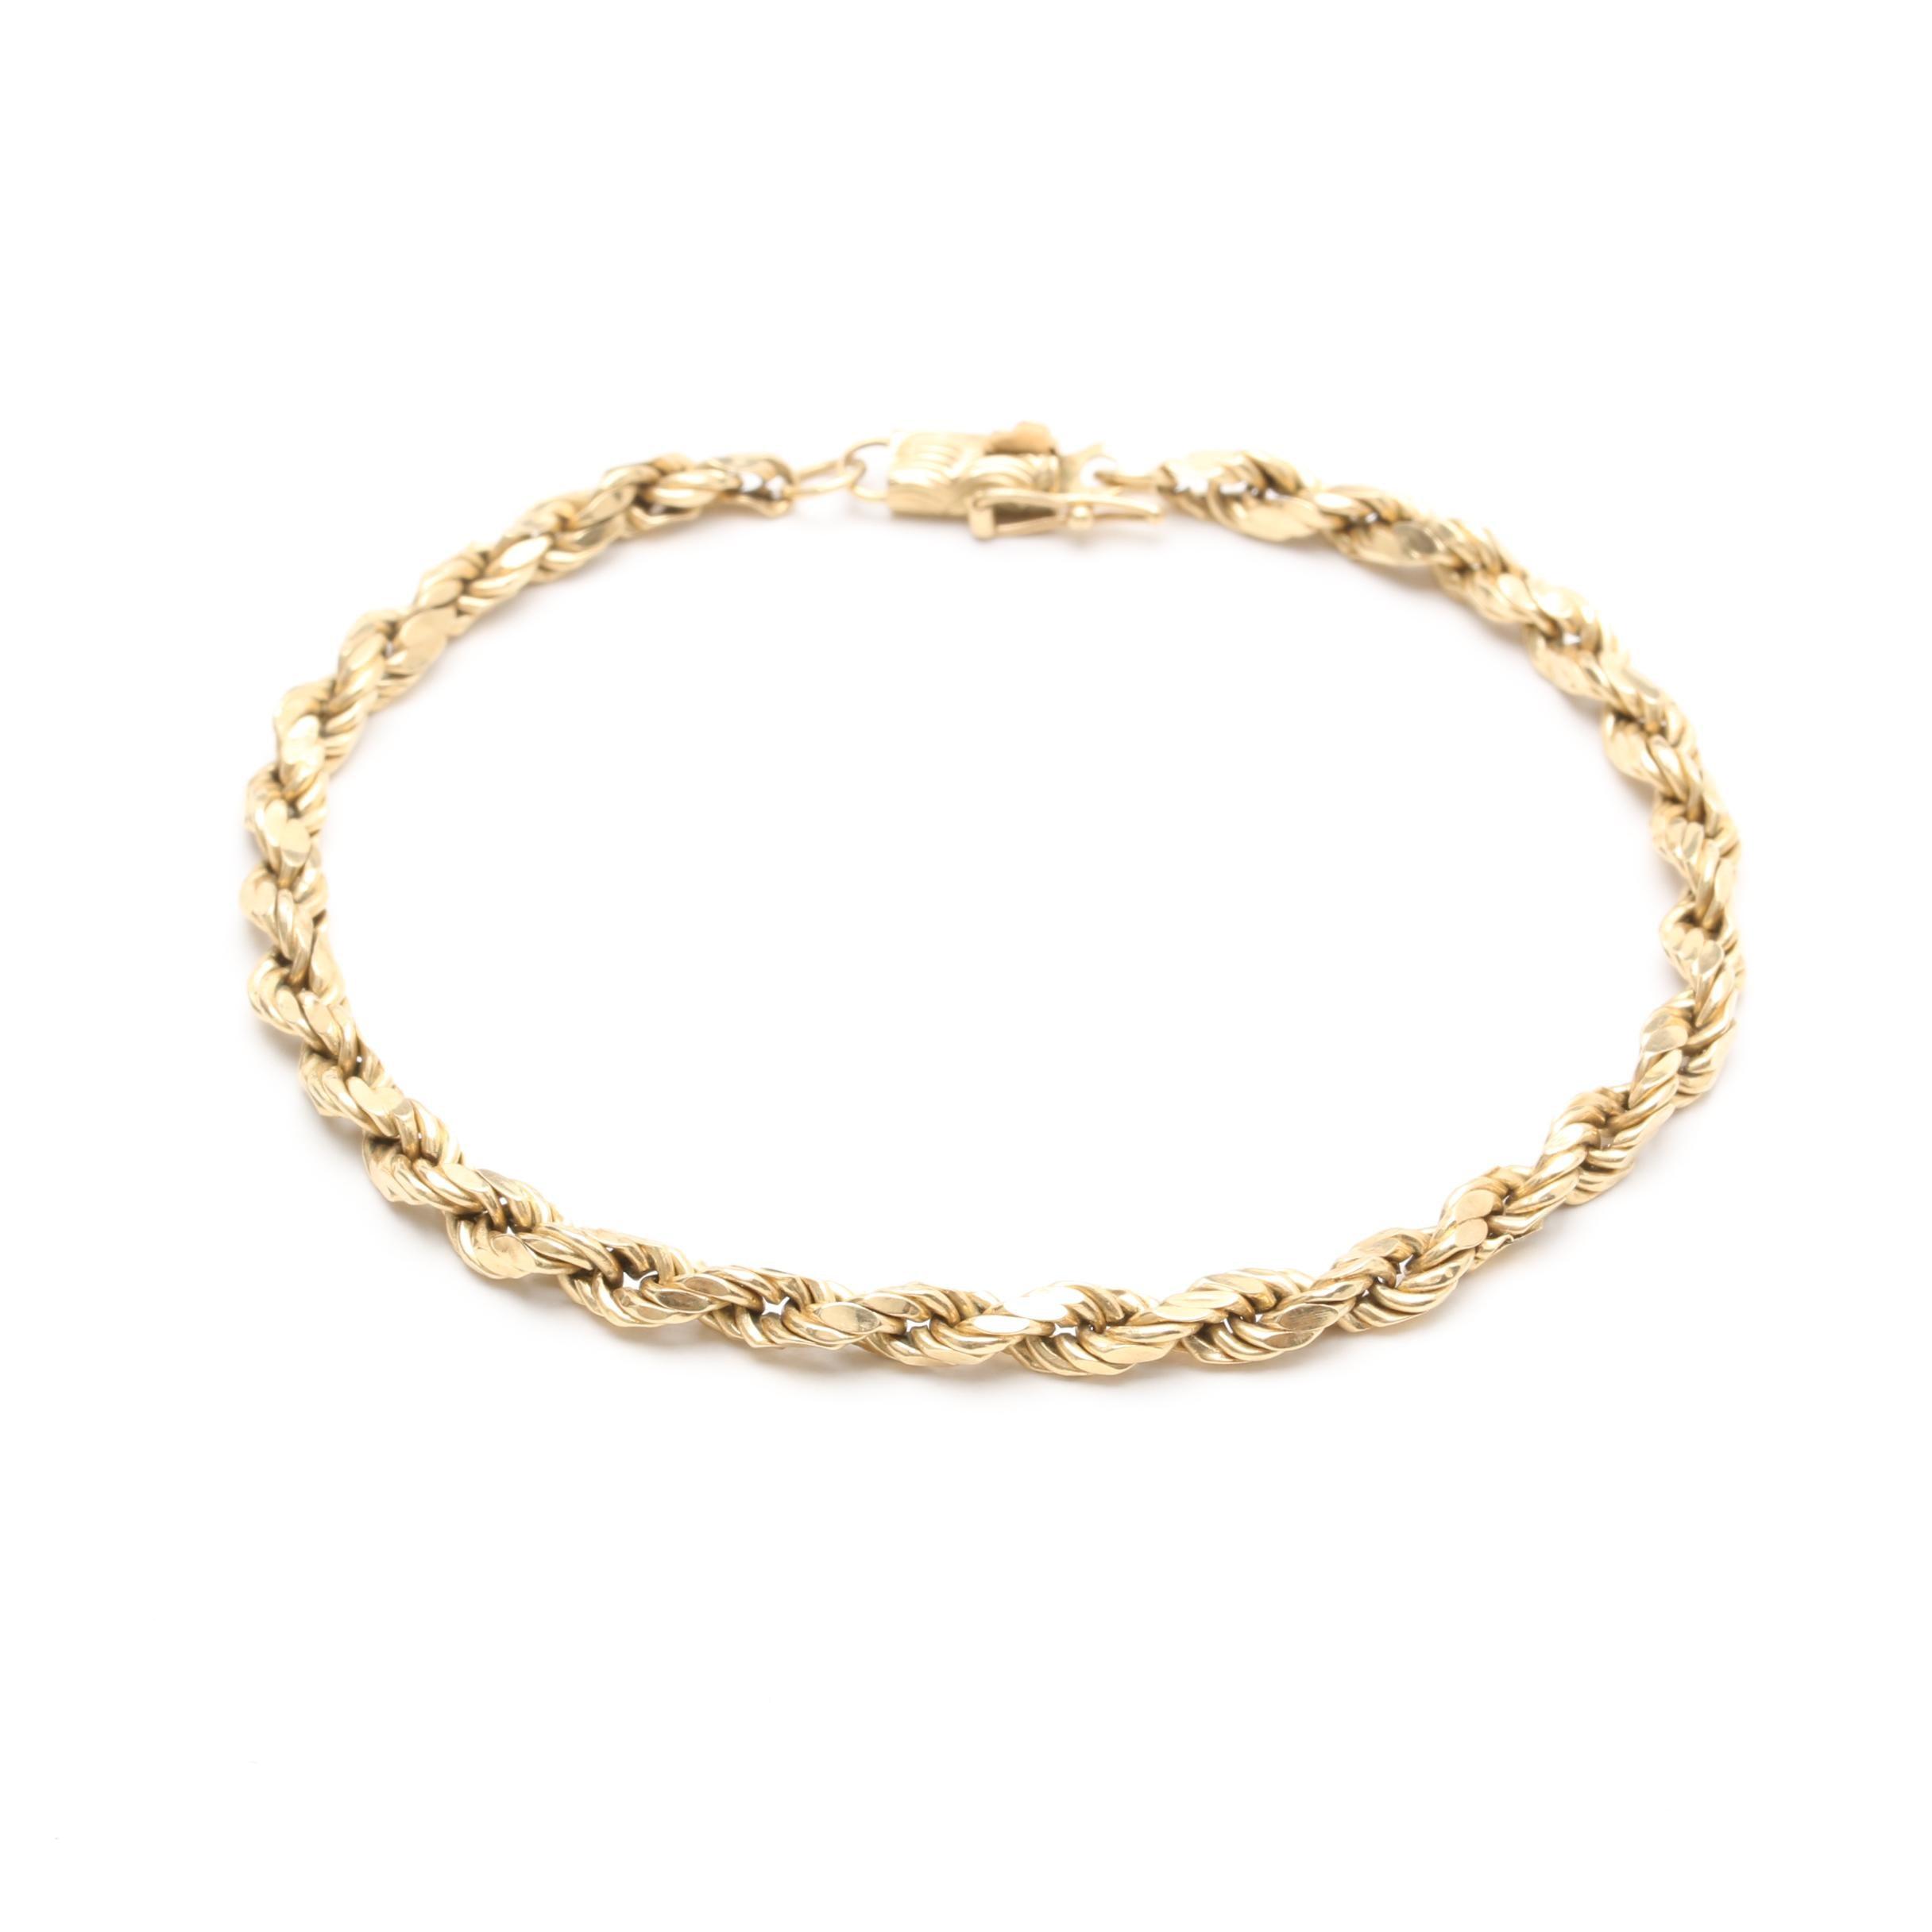 Oroamerica 14K Yellow Gold Rope Link Bracelet